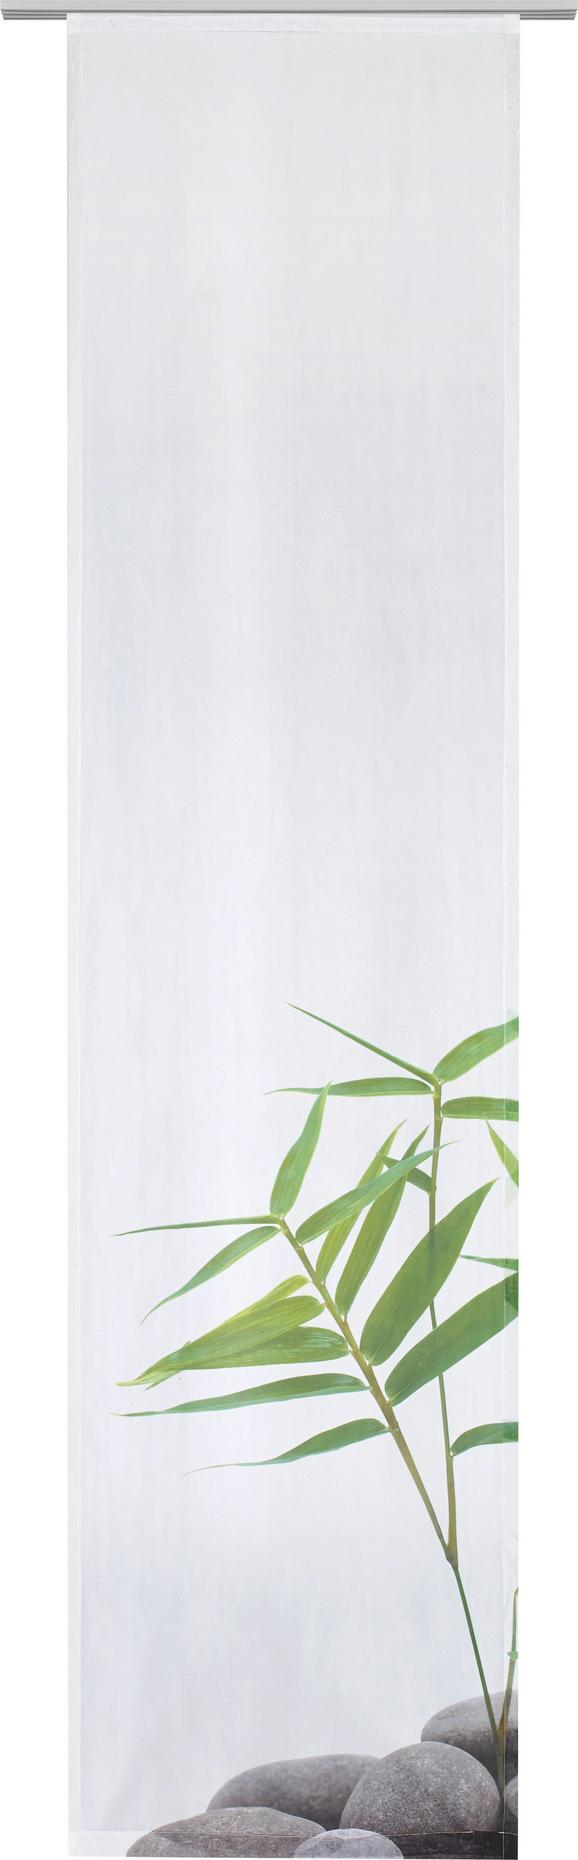 Flächenvorhang Spa Grün/Weiß 60x245cm - Weiß/Grau, LIFESTYLE, Textil (60/245cm) - Mömax modern living